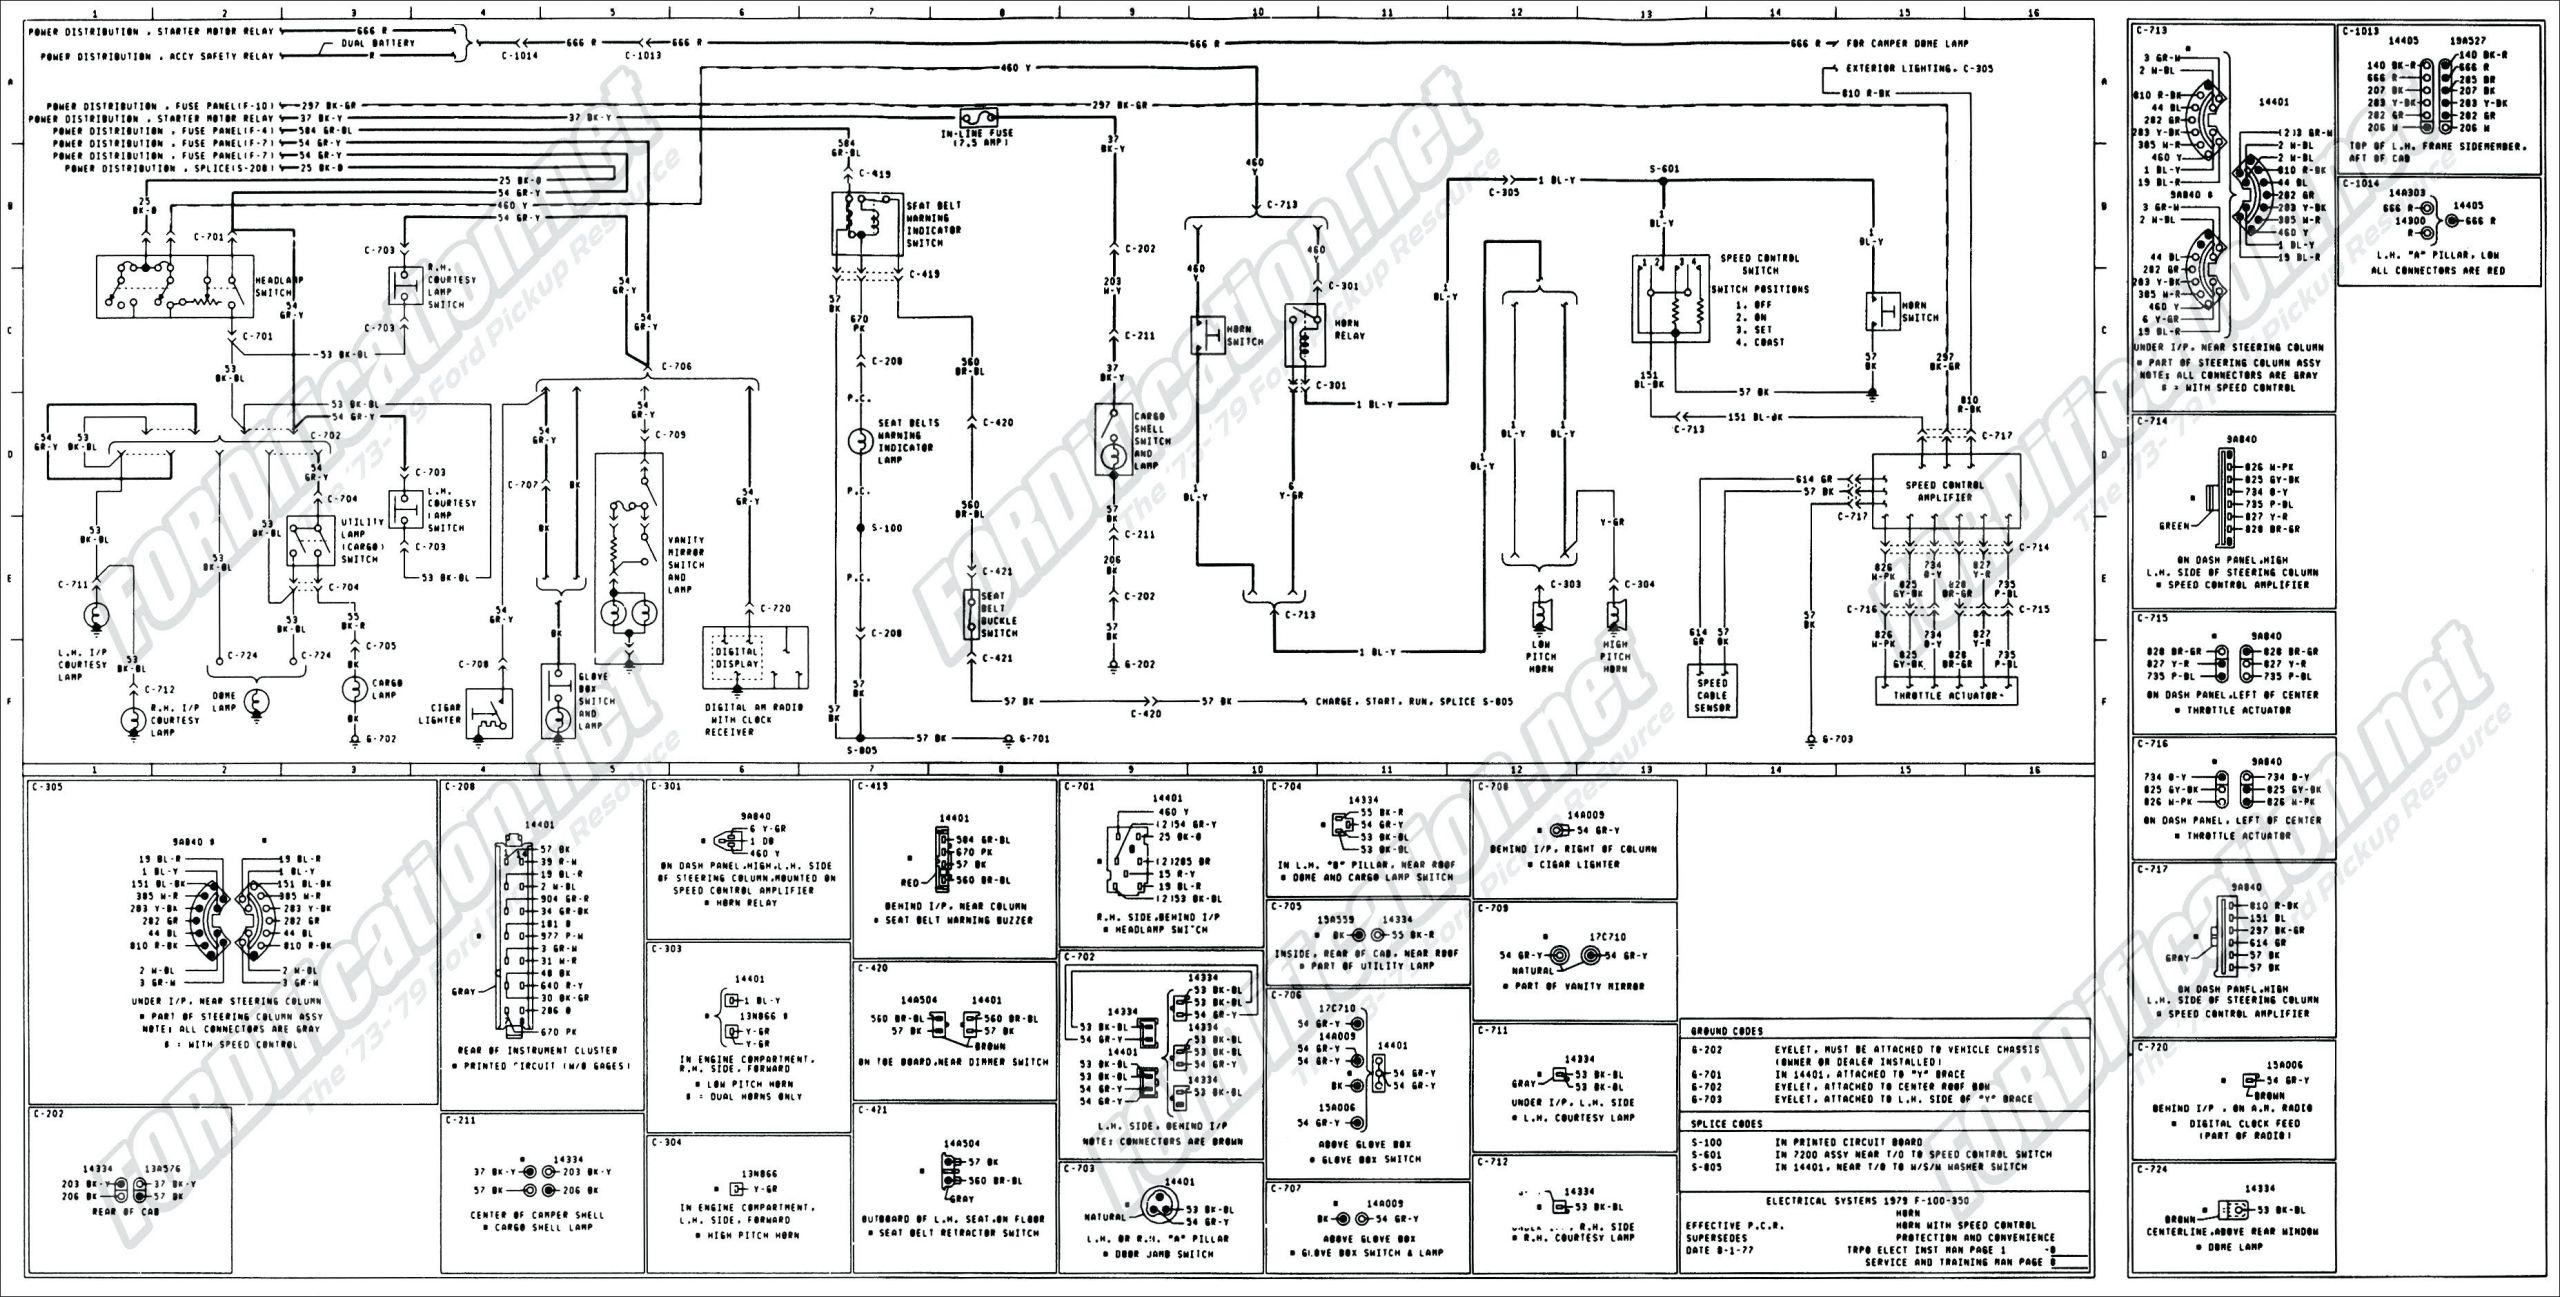 2010 4.6 F150 Wiring Diagram [diagram] ford F150 Diagram Full Version Hd Quality F150 Diagram Sessionetteschematic2297